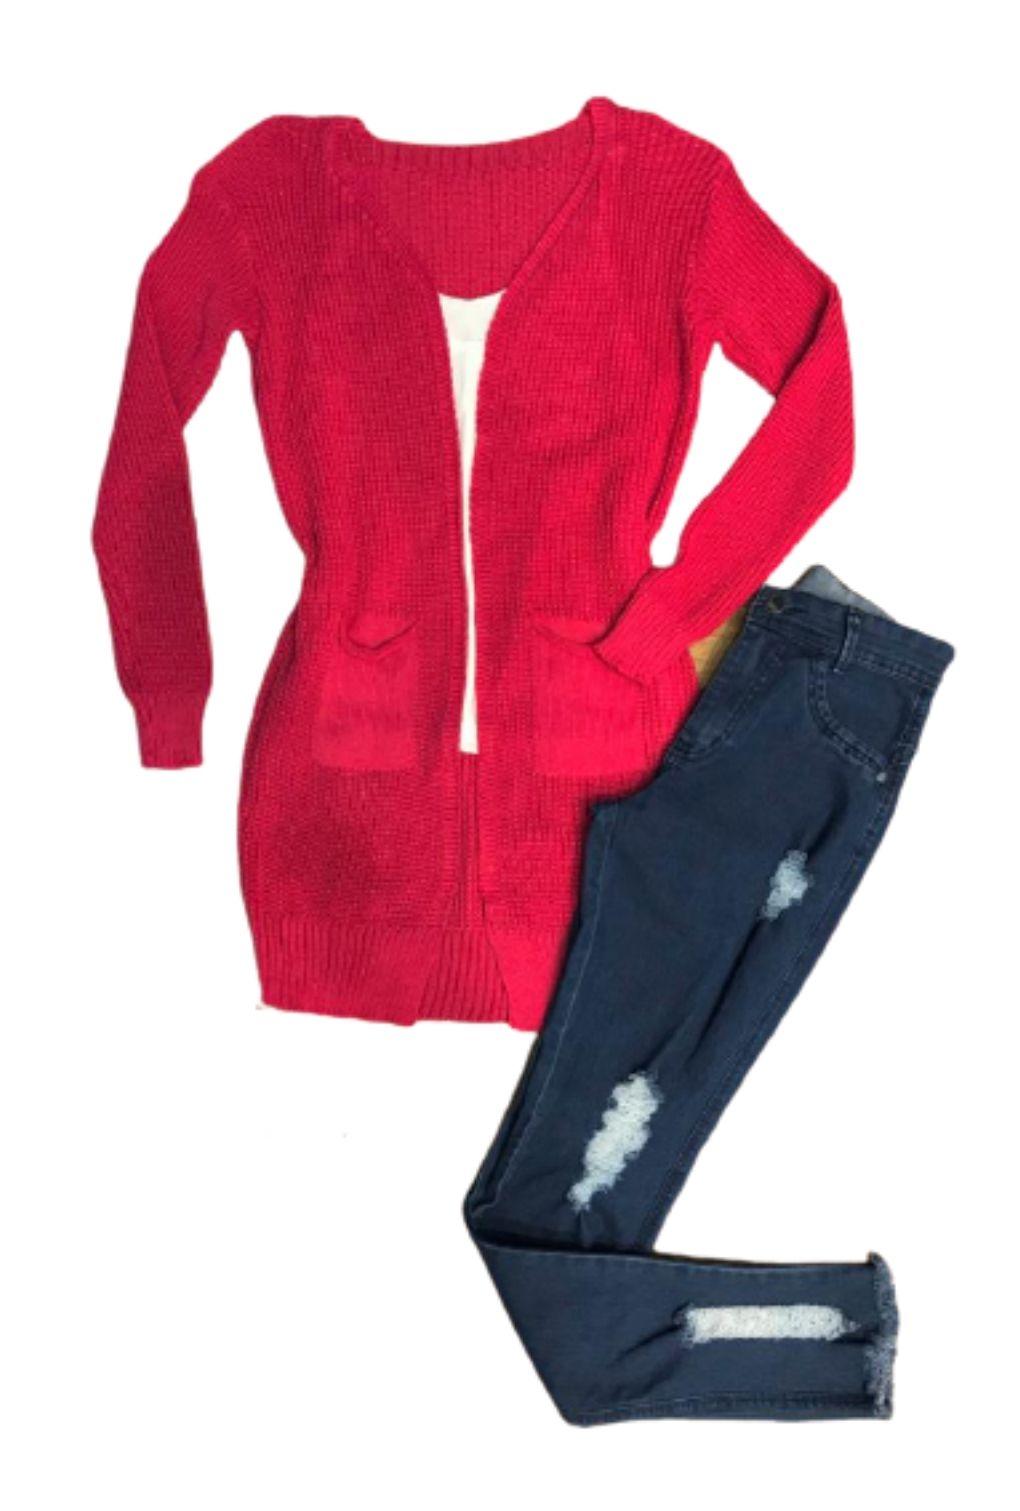 Casaco Cardigan Inverno Feminino Liso Aberto com Bolso  - ModaStore | Moda Feminina